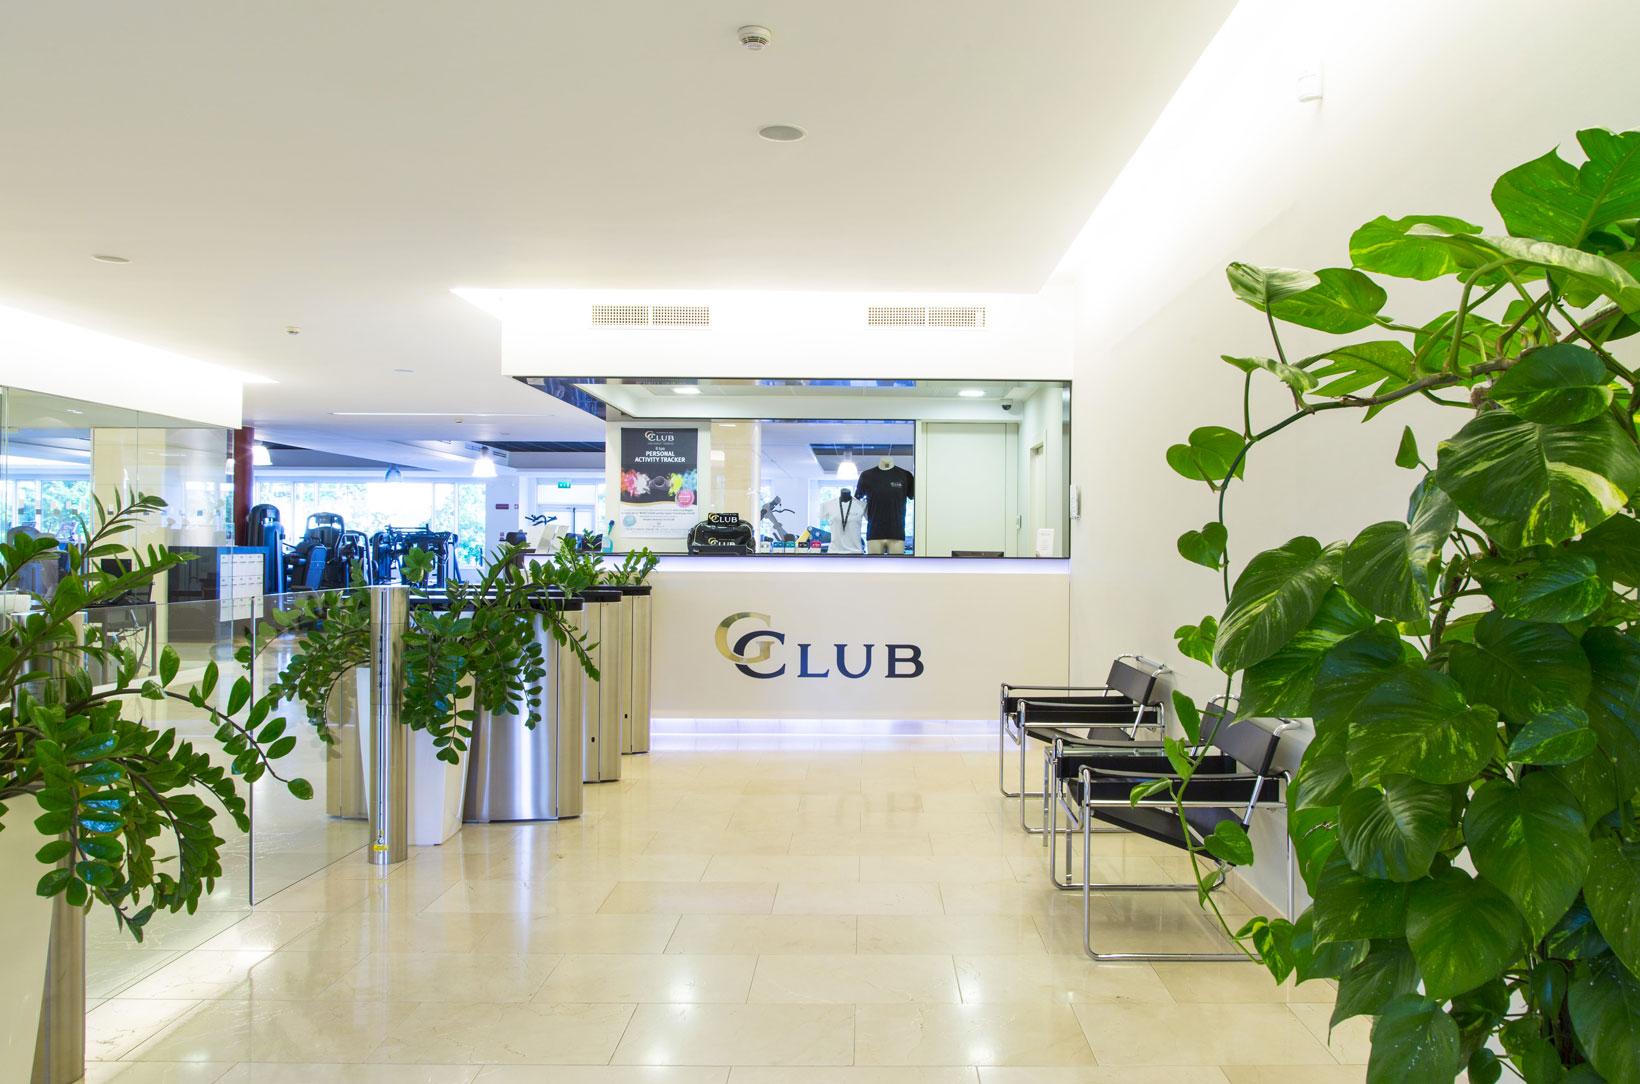 gclub segreteria